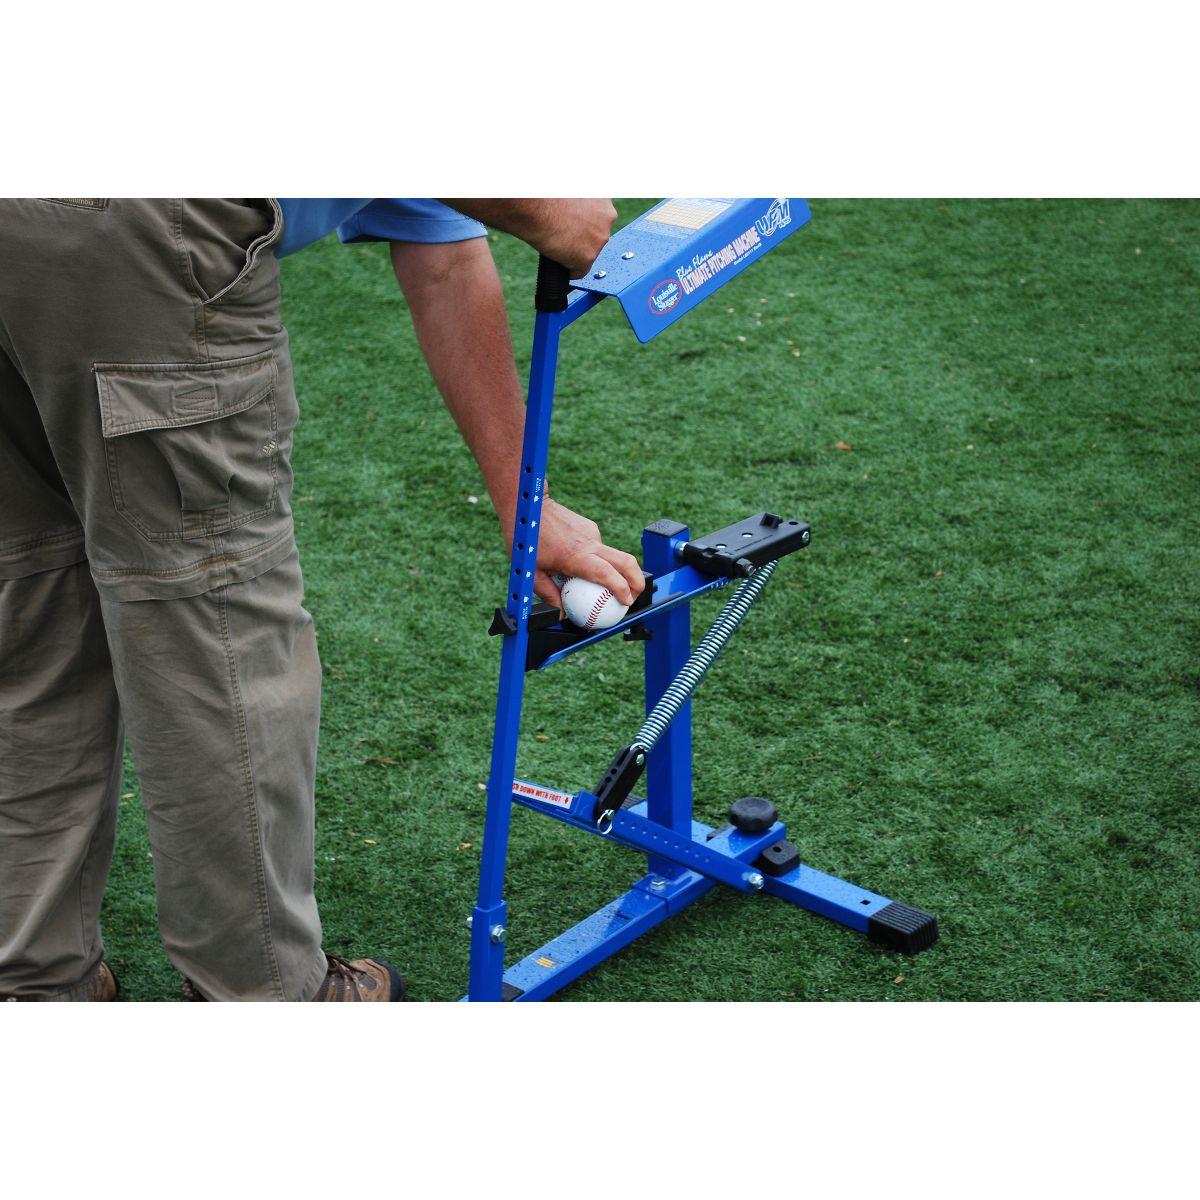 blue pitching machine